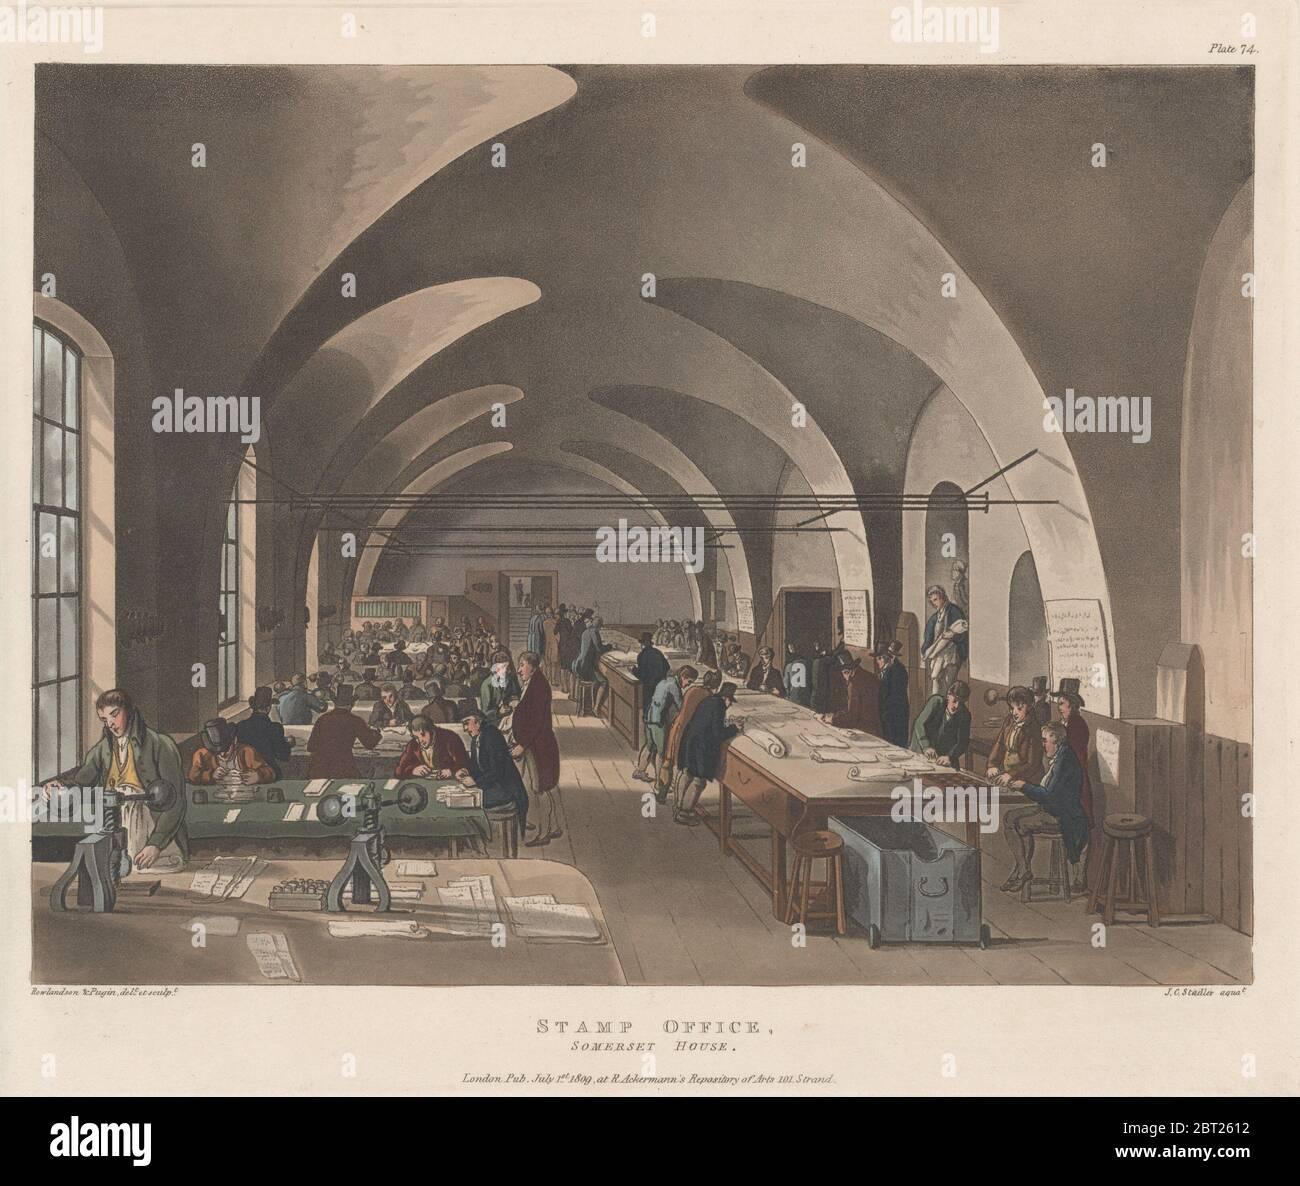 Bureau du timbre, Somerset House, 1er juillet 1809. Banque D'Images